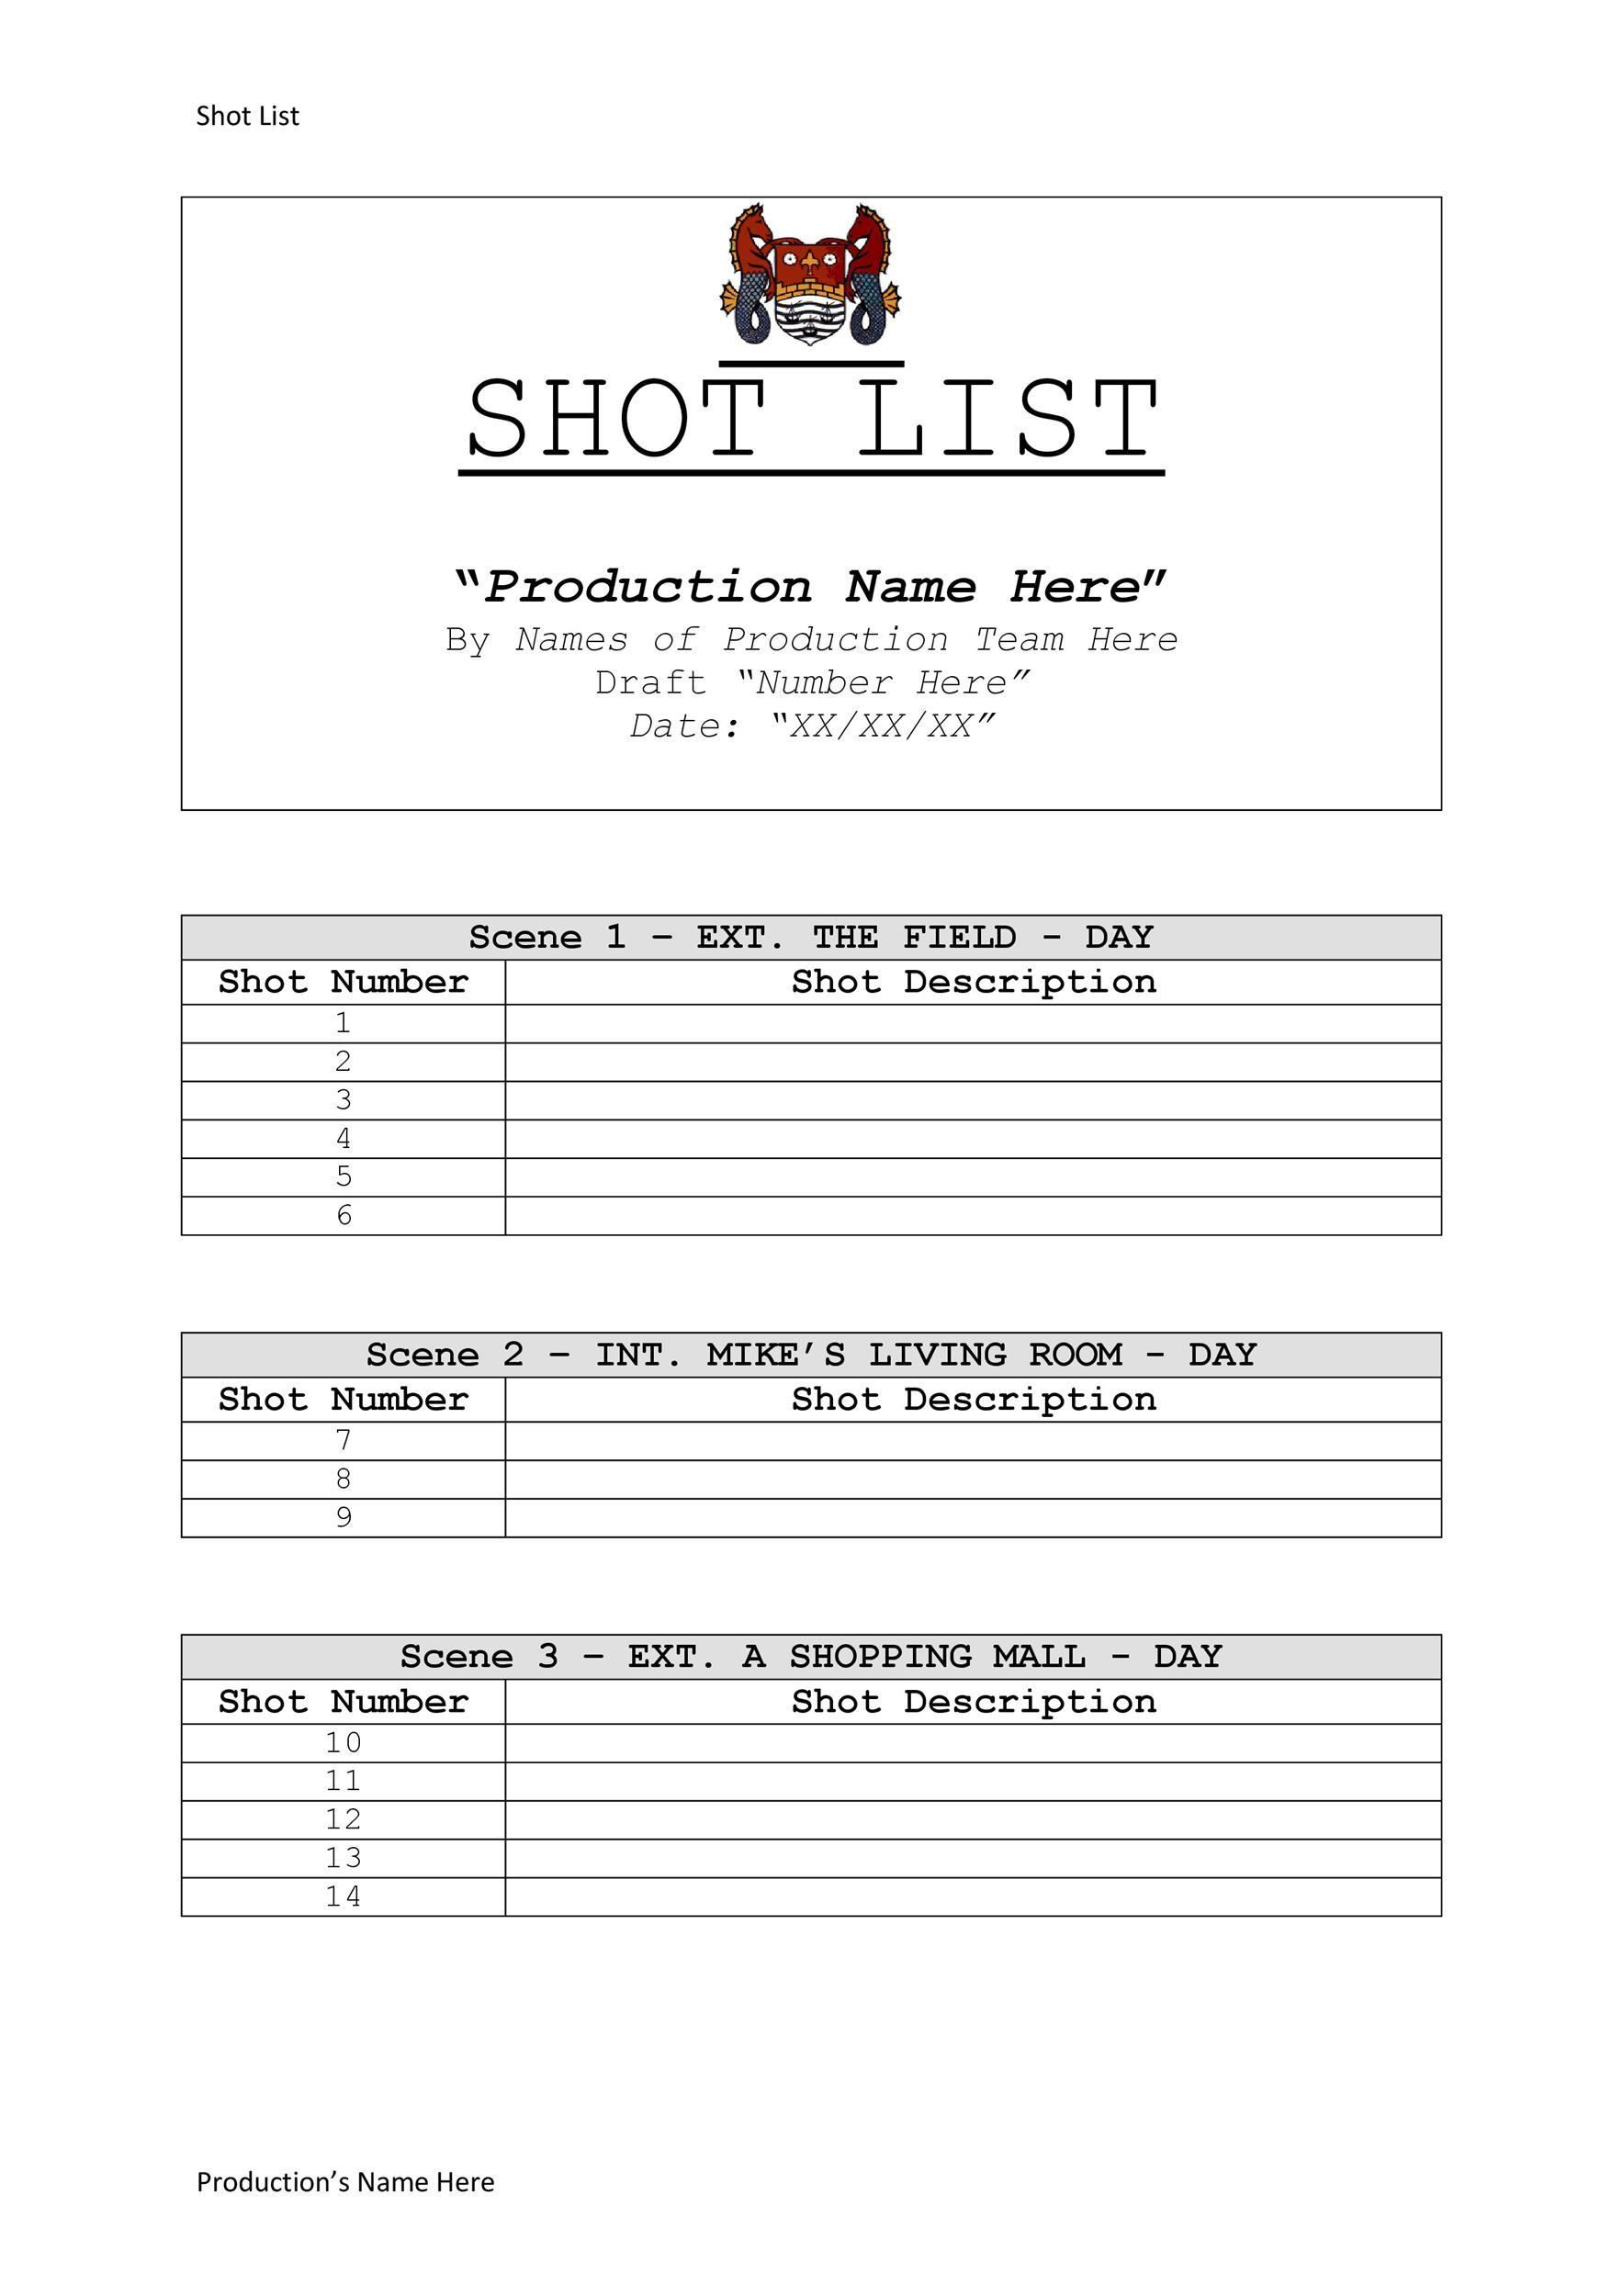 Free shot list template 27